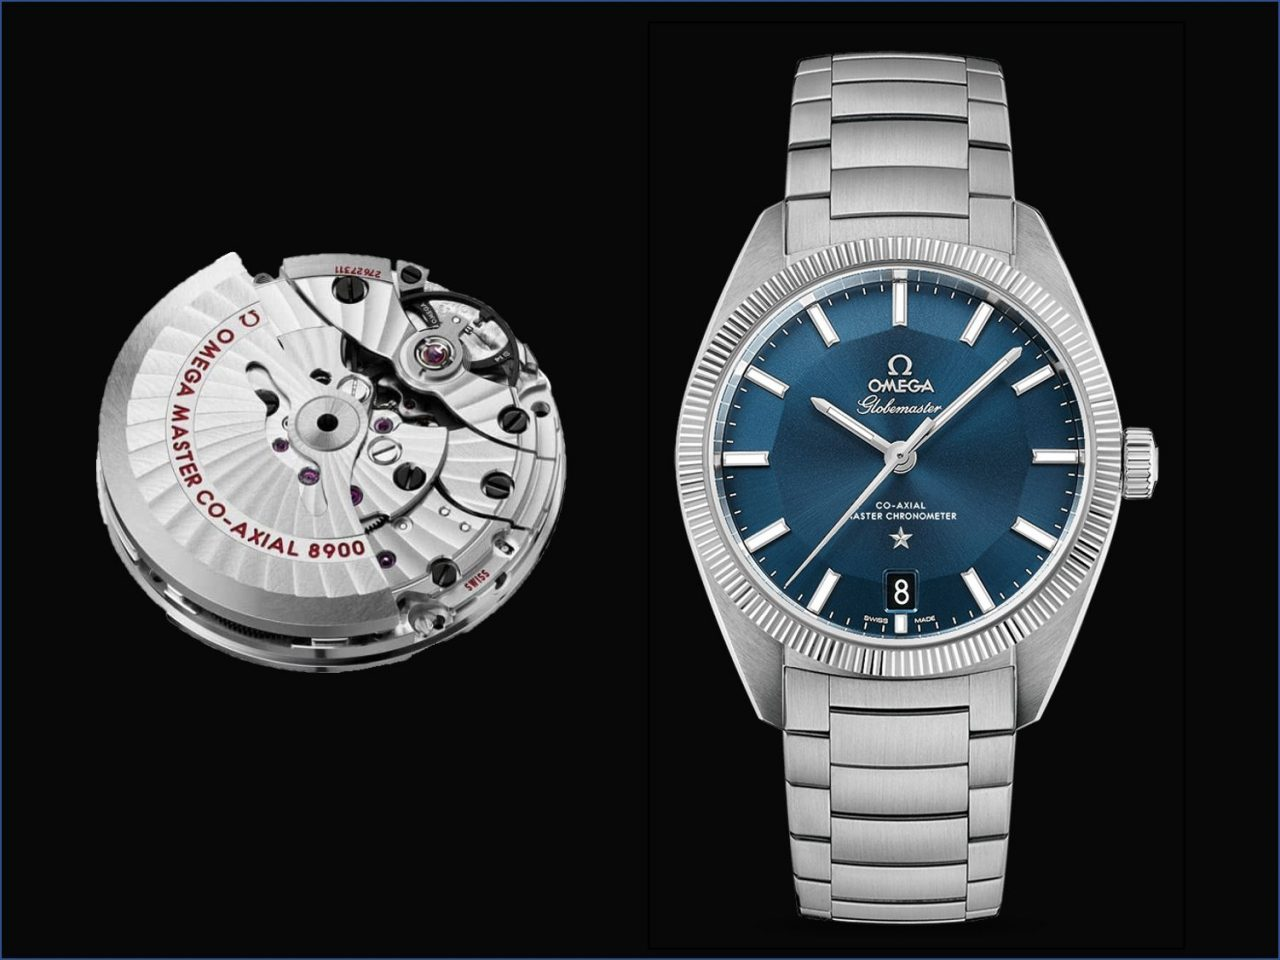 Omega Constellation Globemaster Co-Axial Master Chronometer –  so geht doppelt geprüfte Präzision